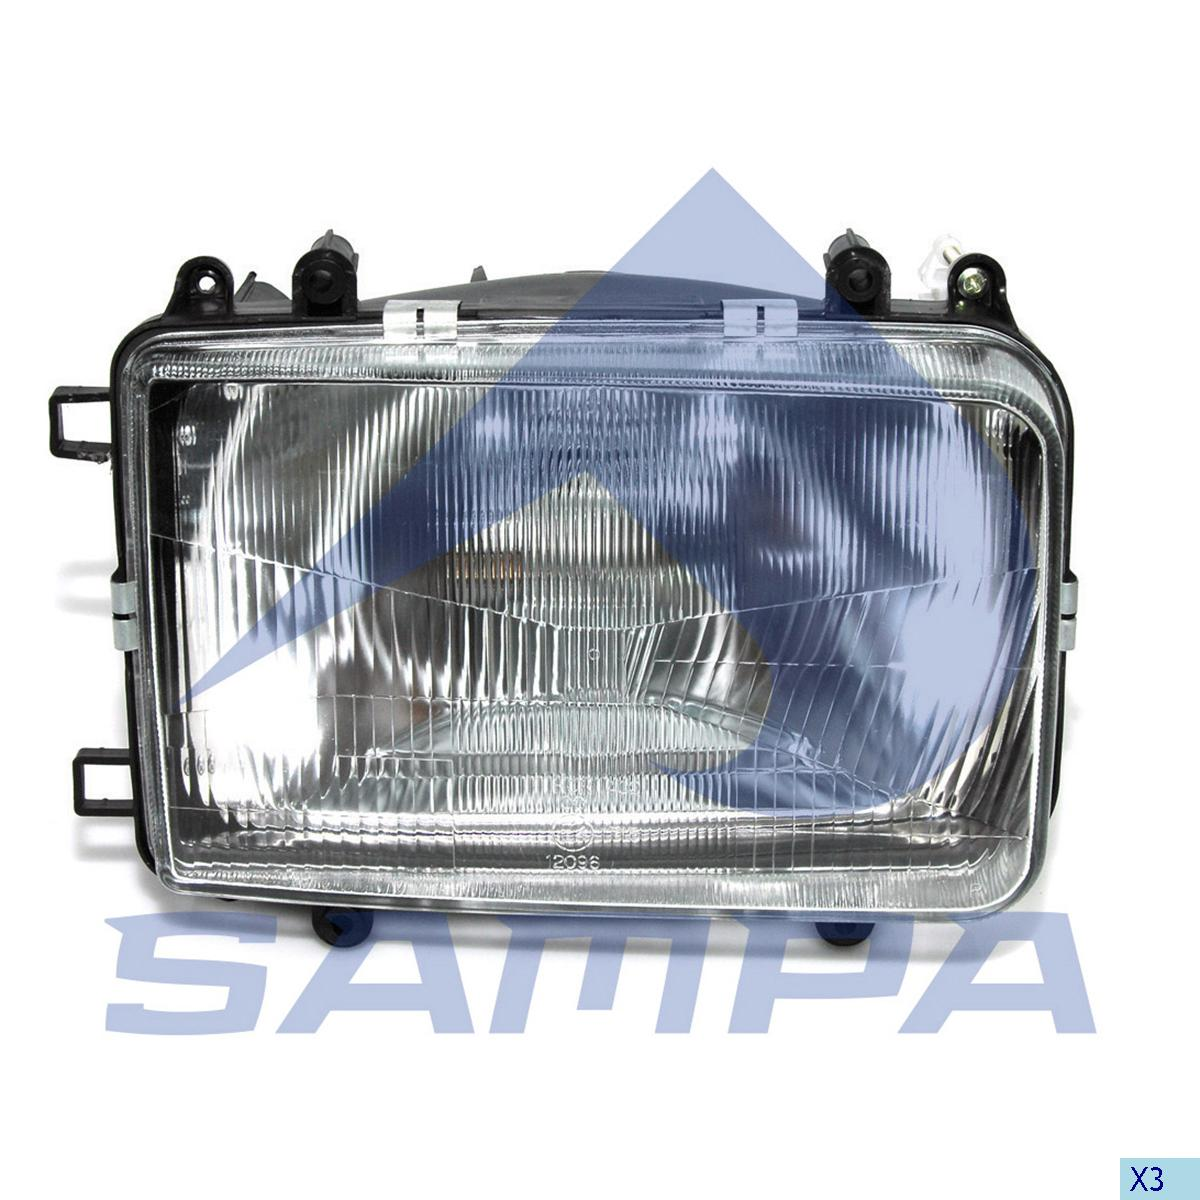 Head Lamp, Daf, Electric System